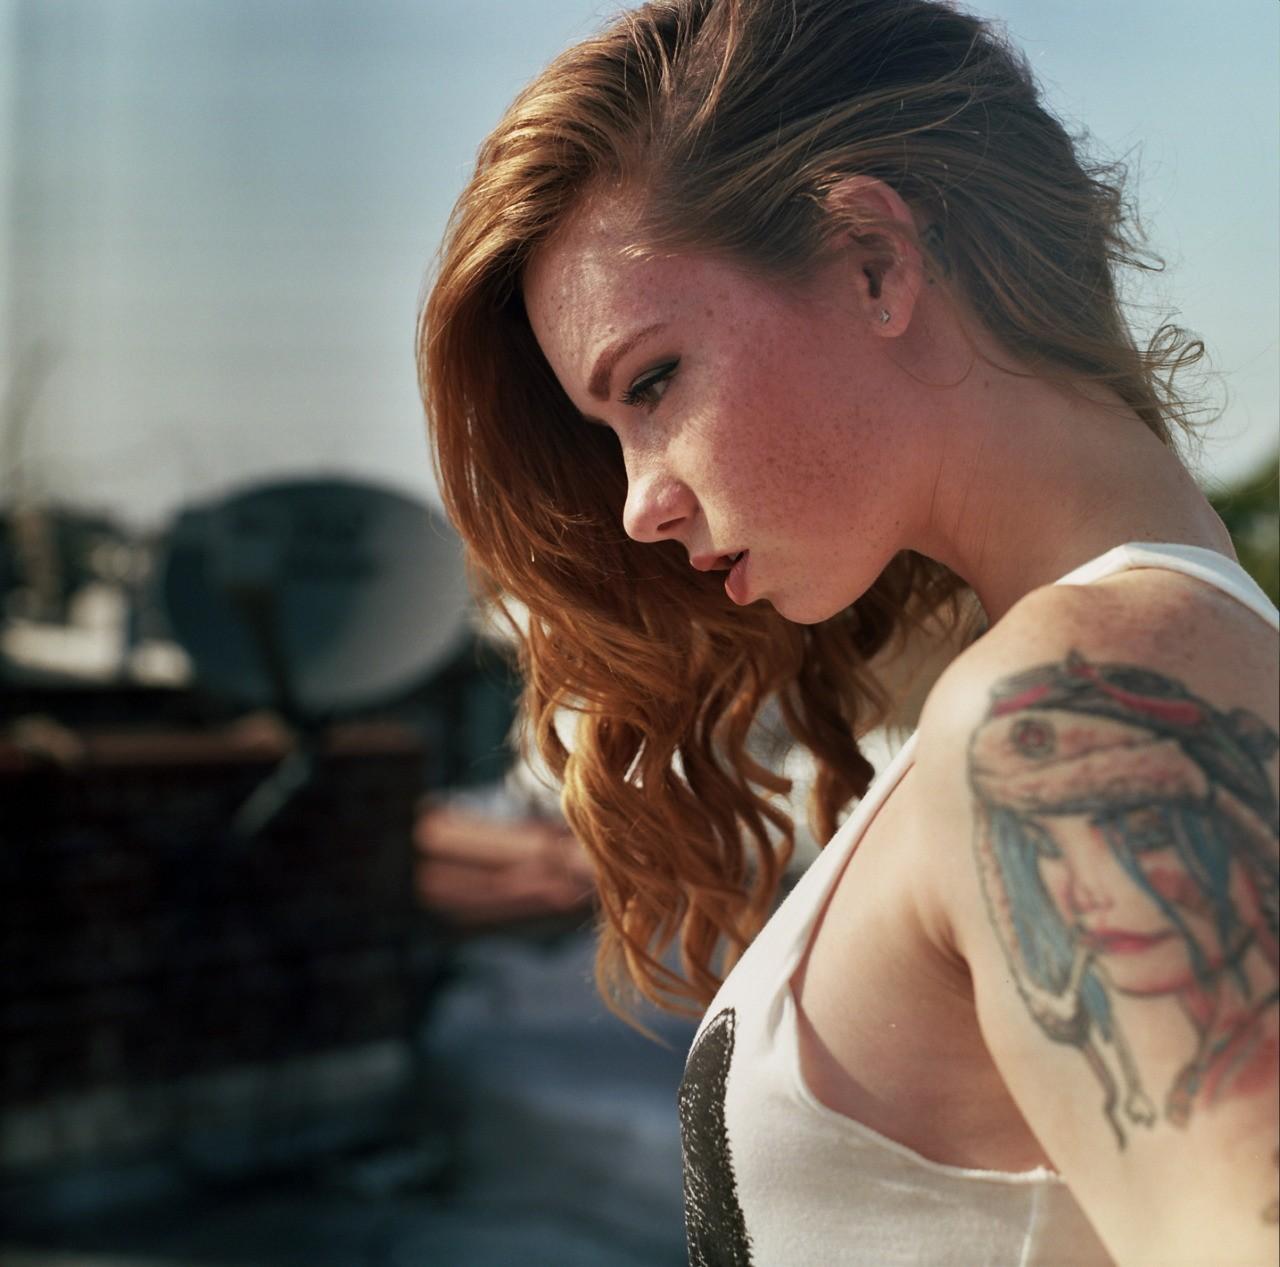 Tattoo Woman Photo: 50 Tatuajes Muy Sexys De Mujeres Sensuales